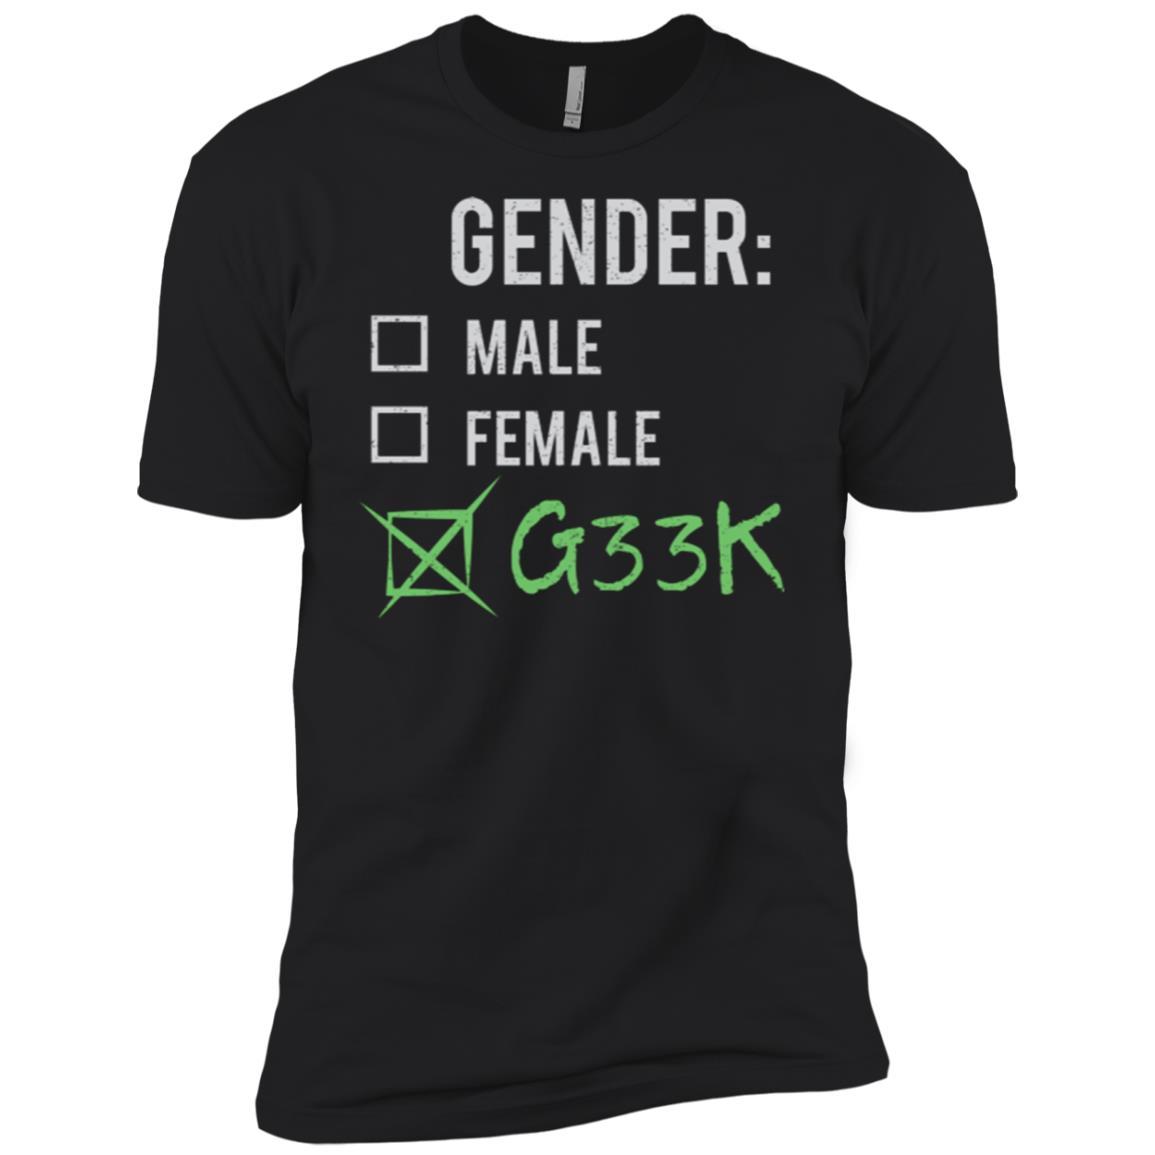 Male Female Geek Gender Nonbinary Trans Men Short Sleeve T-Shirt